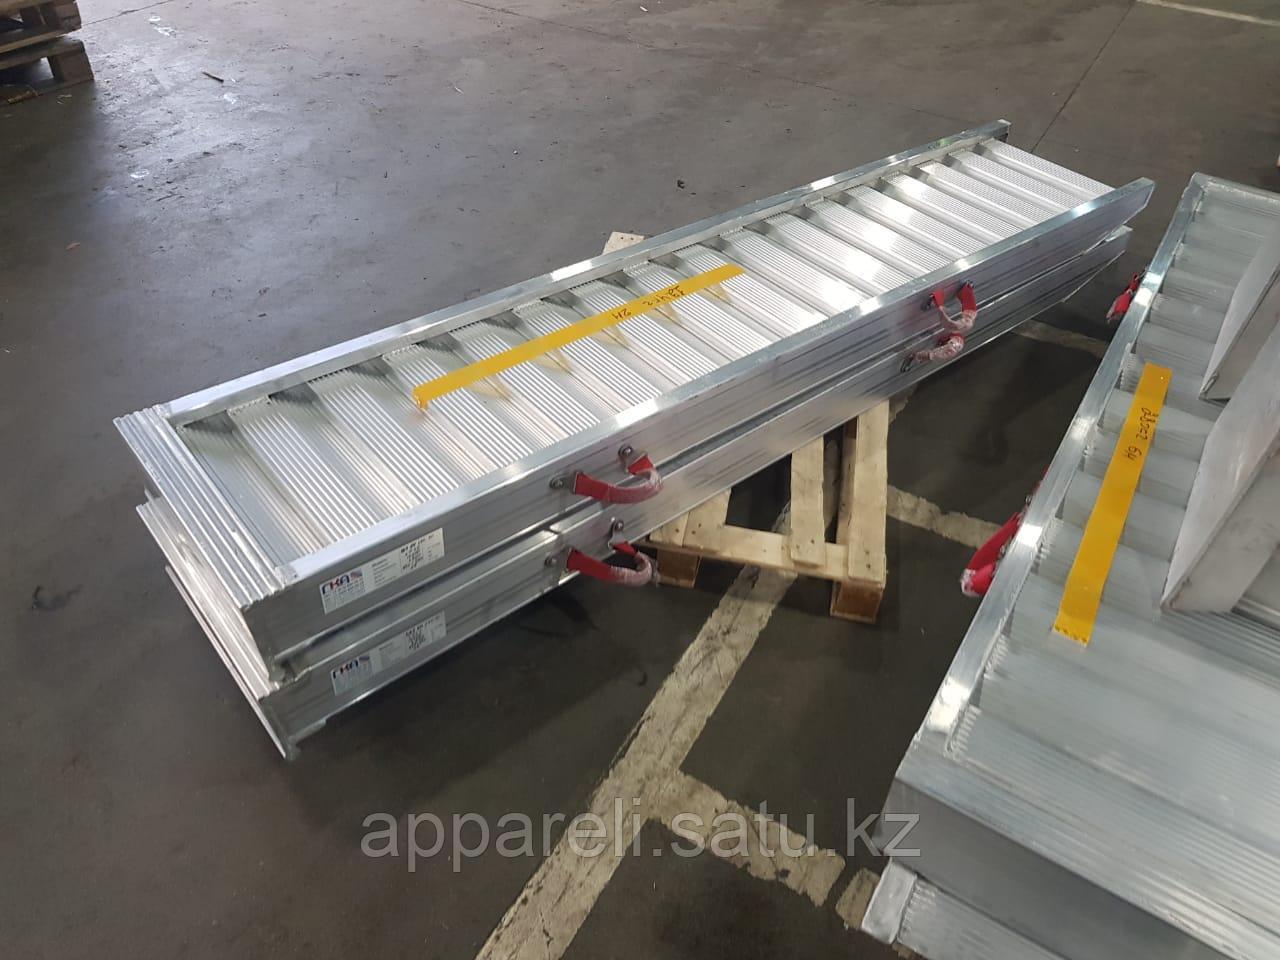 Алюминиевые аппарели от производителя 2 метра, 11 тонн